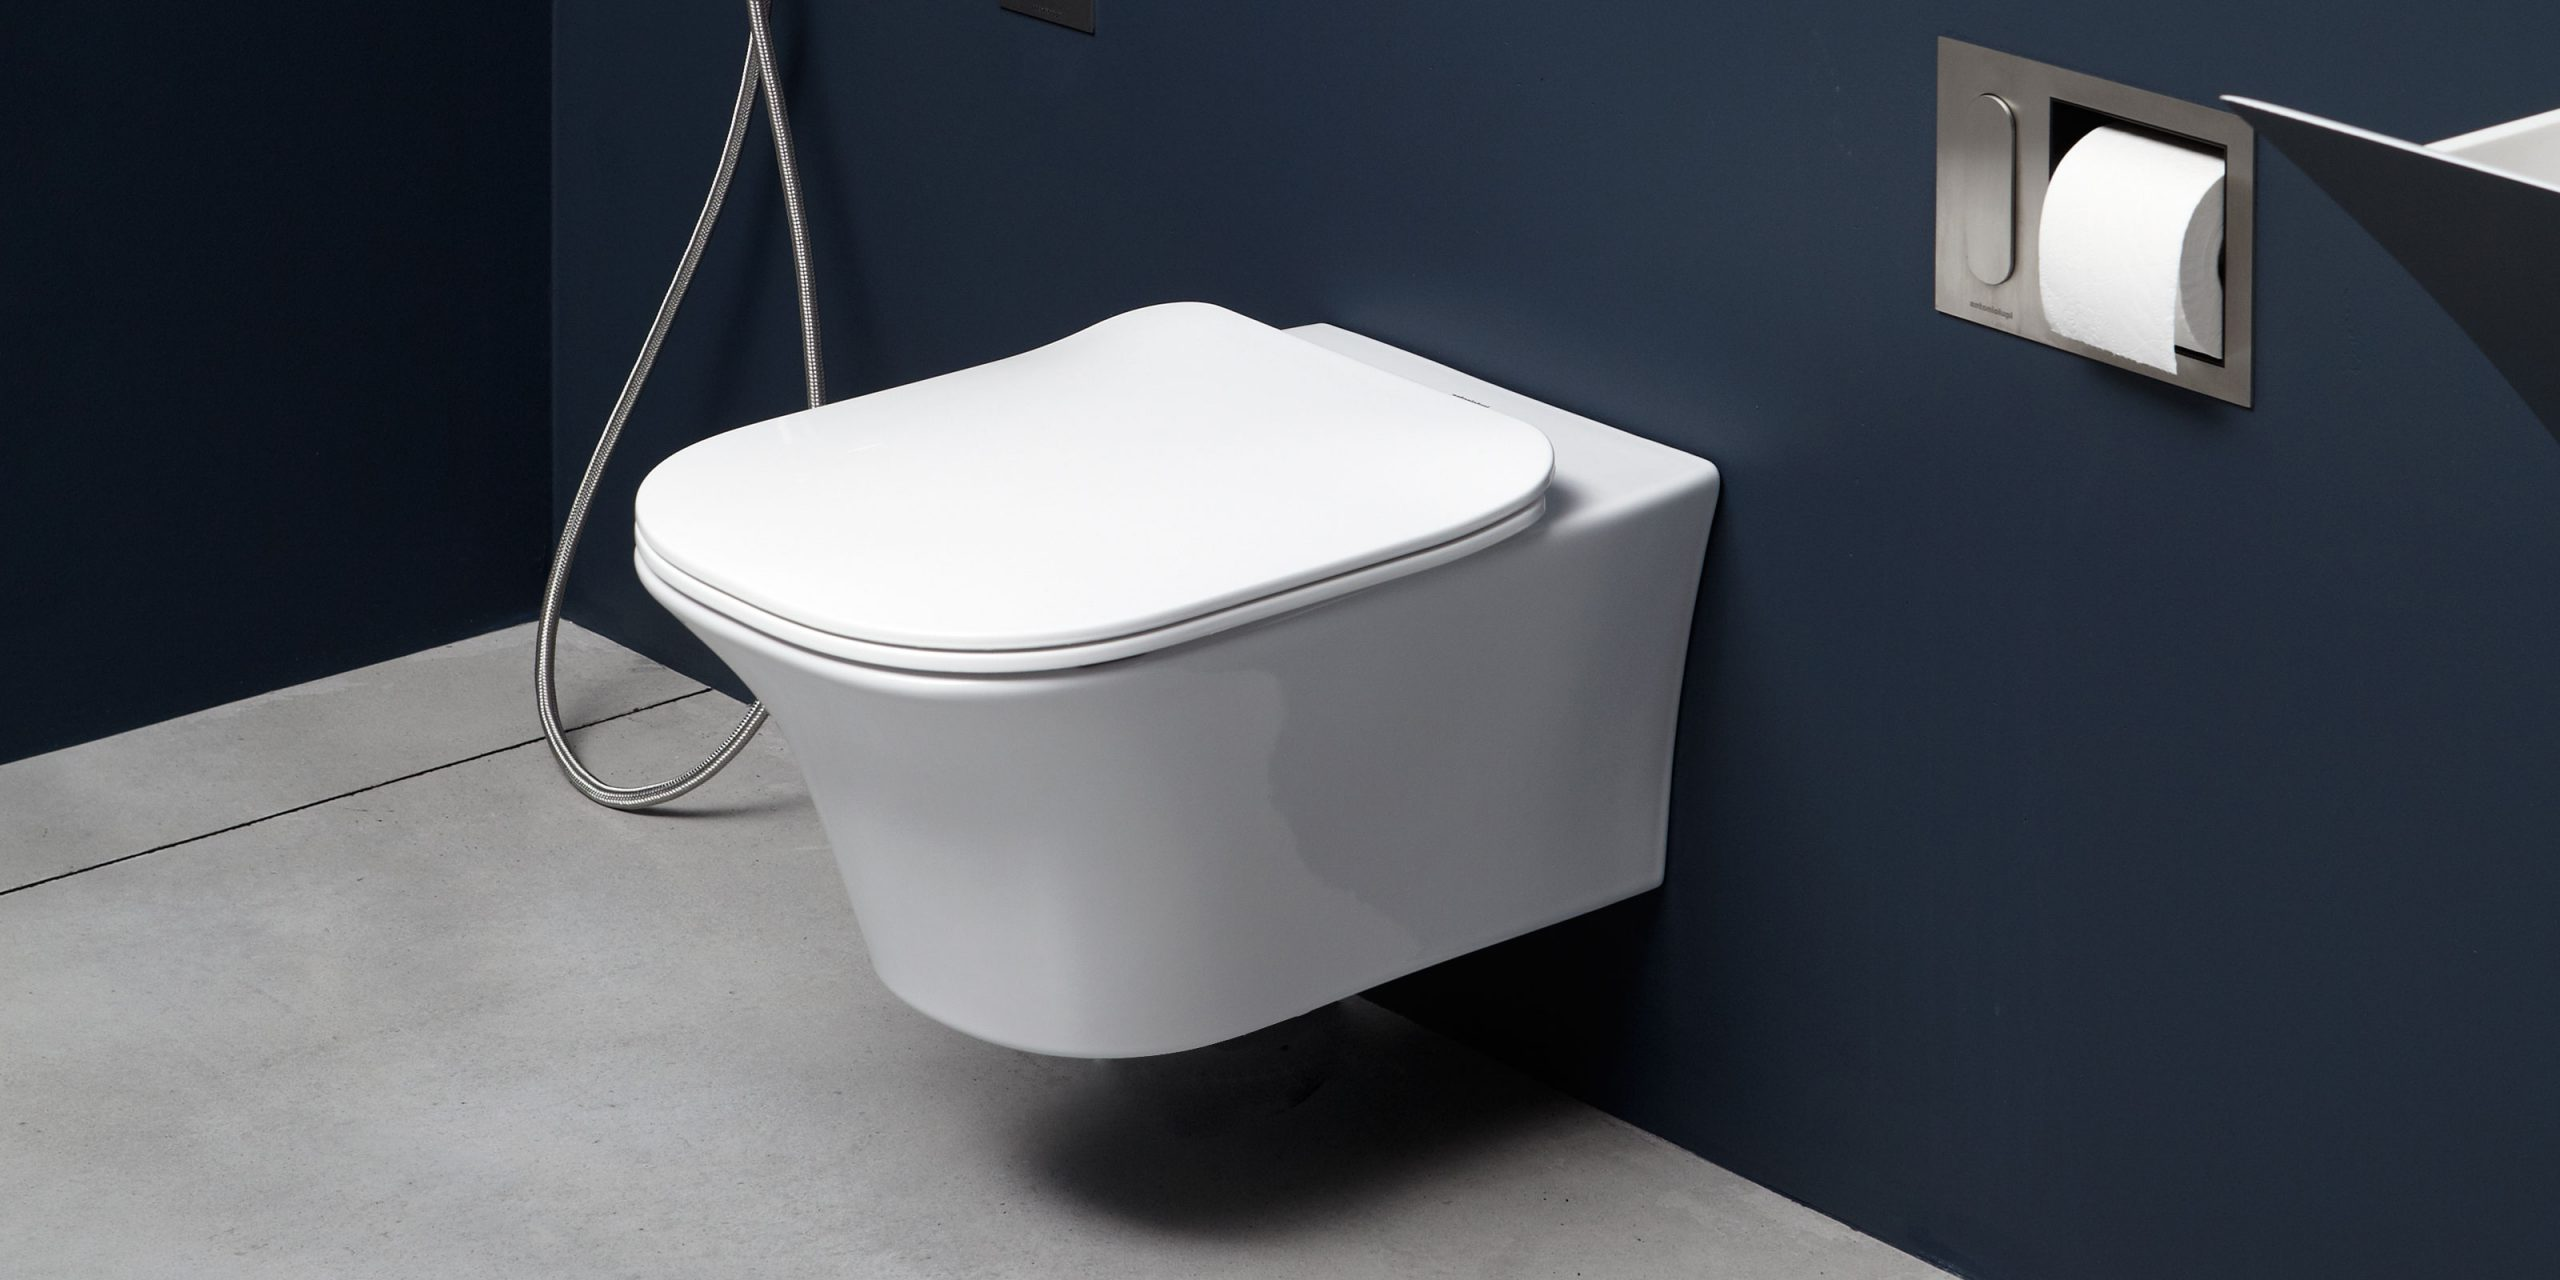 Cabo sanitaryware by Debiasi Sandri for Antoniolupi, wc and bidet